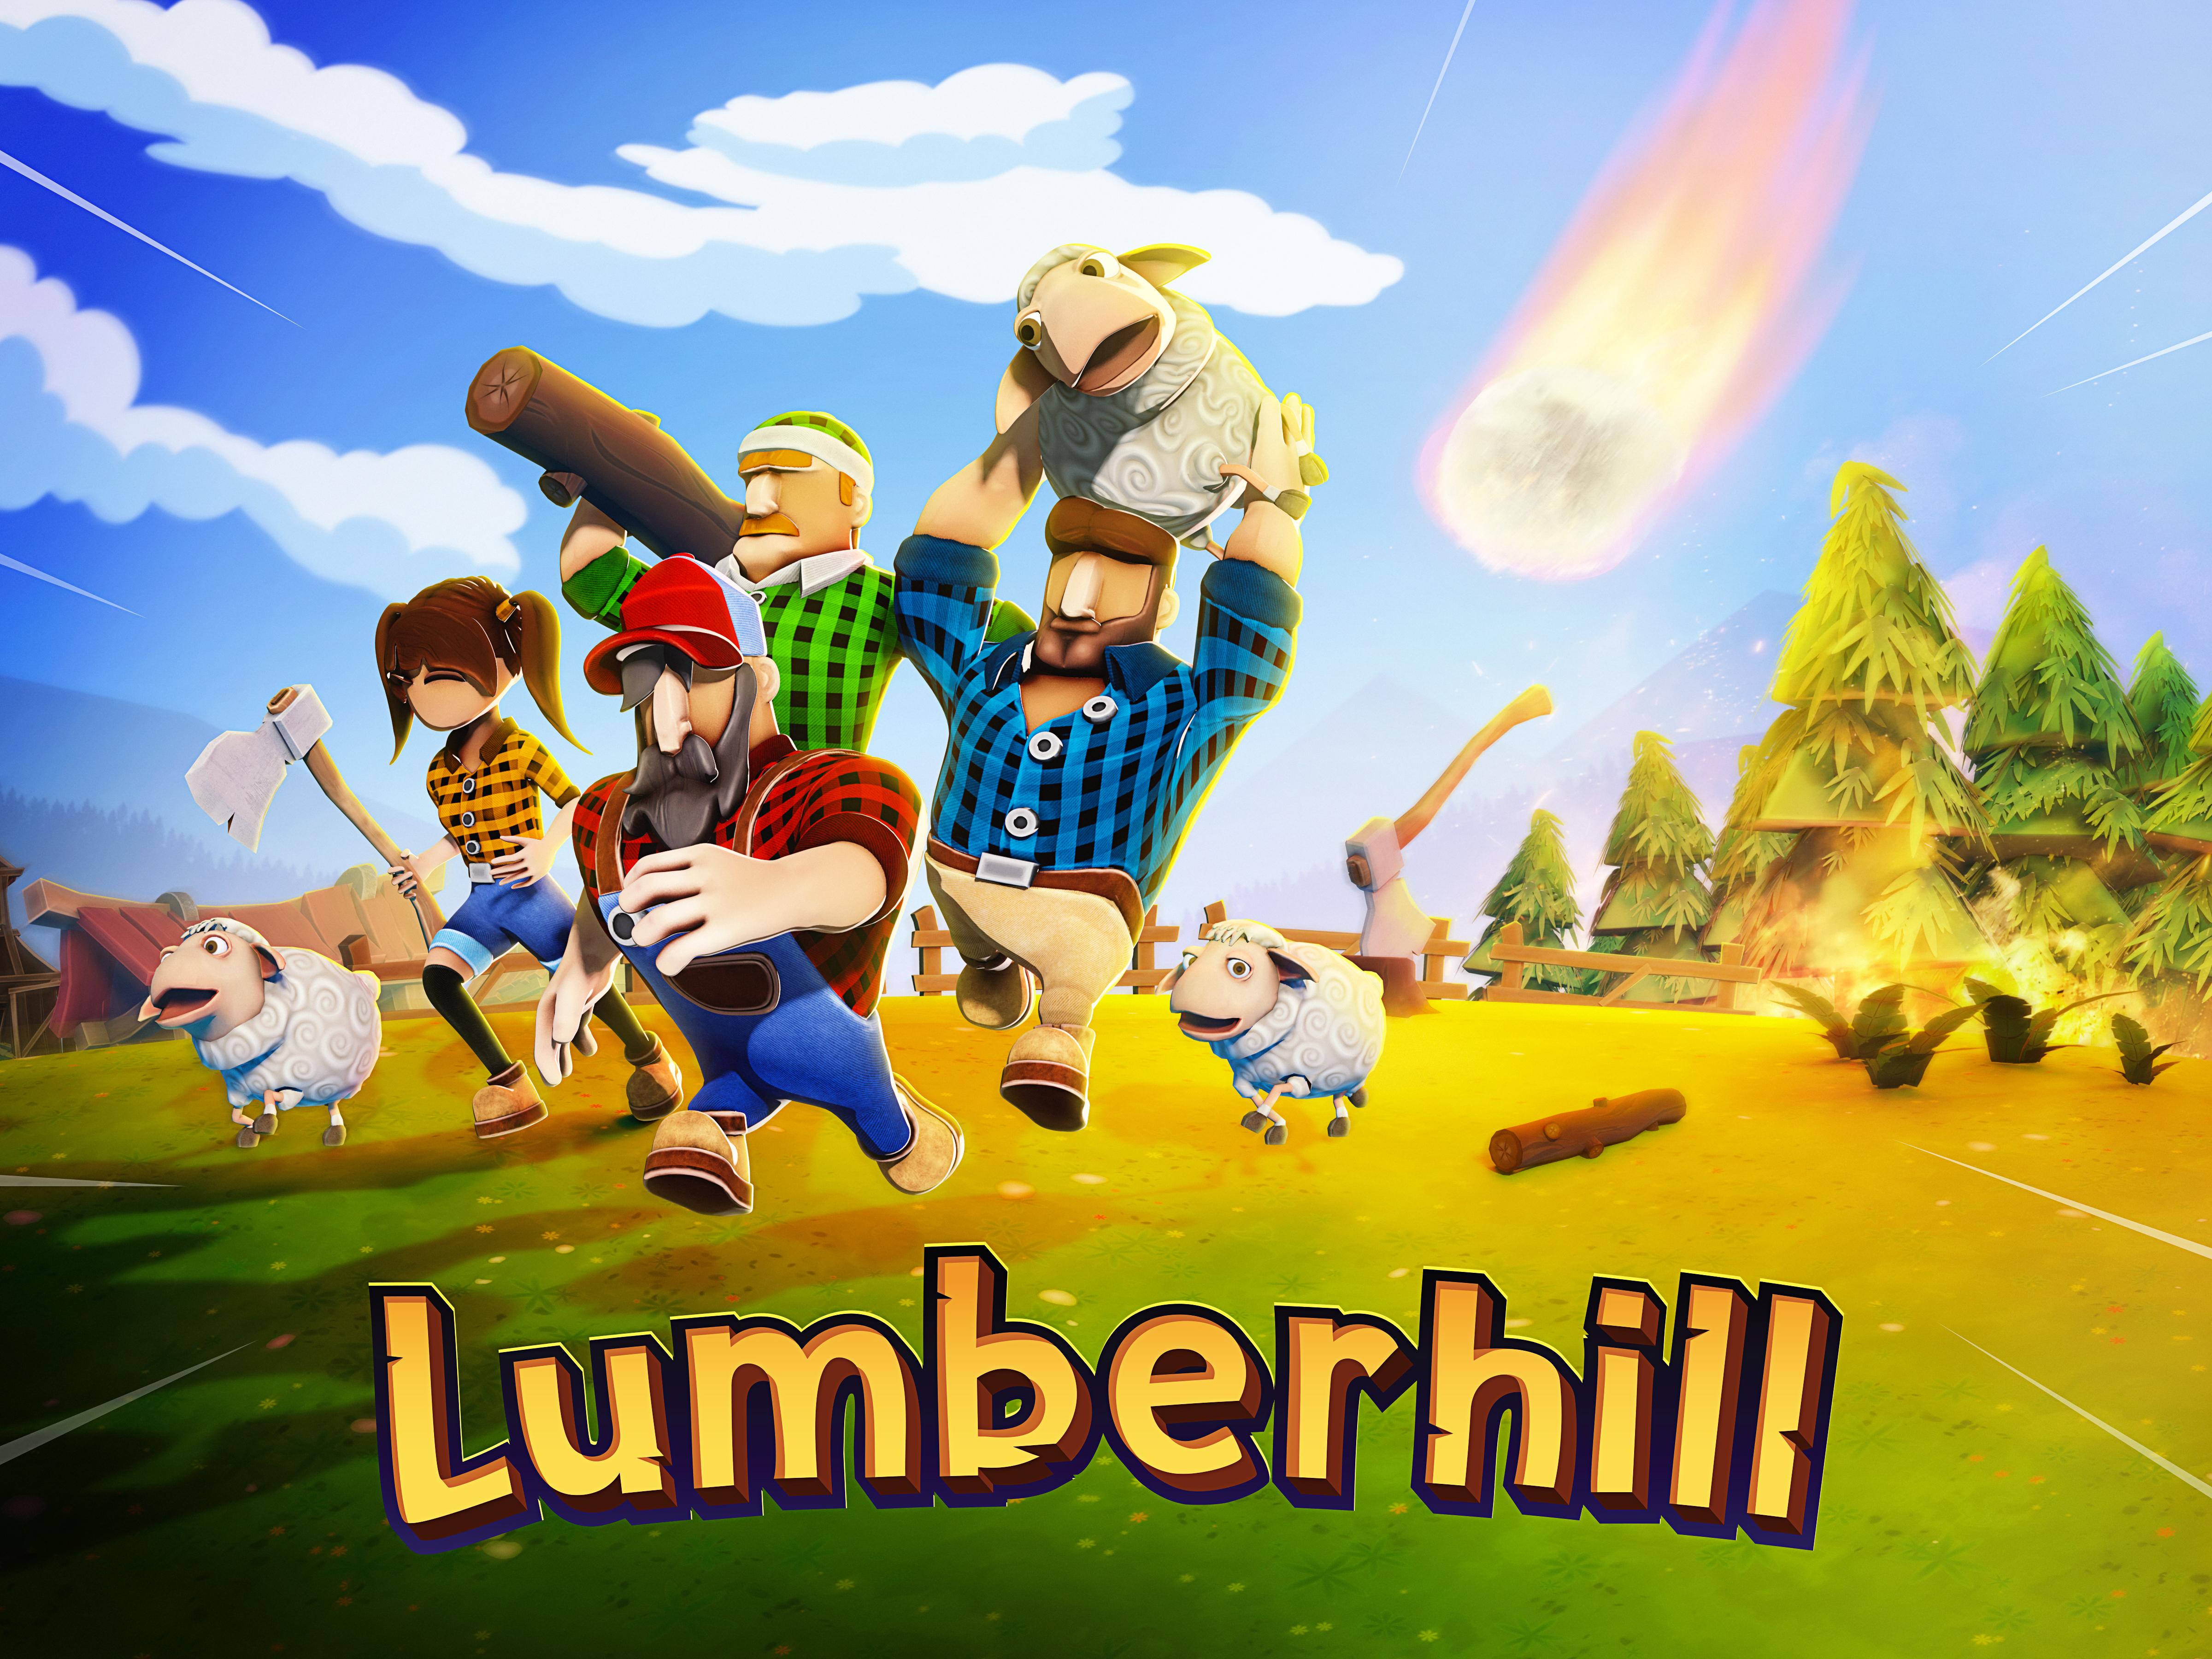 Lumberhill promotional graphic